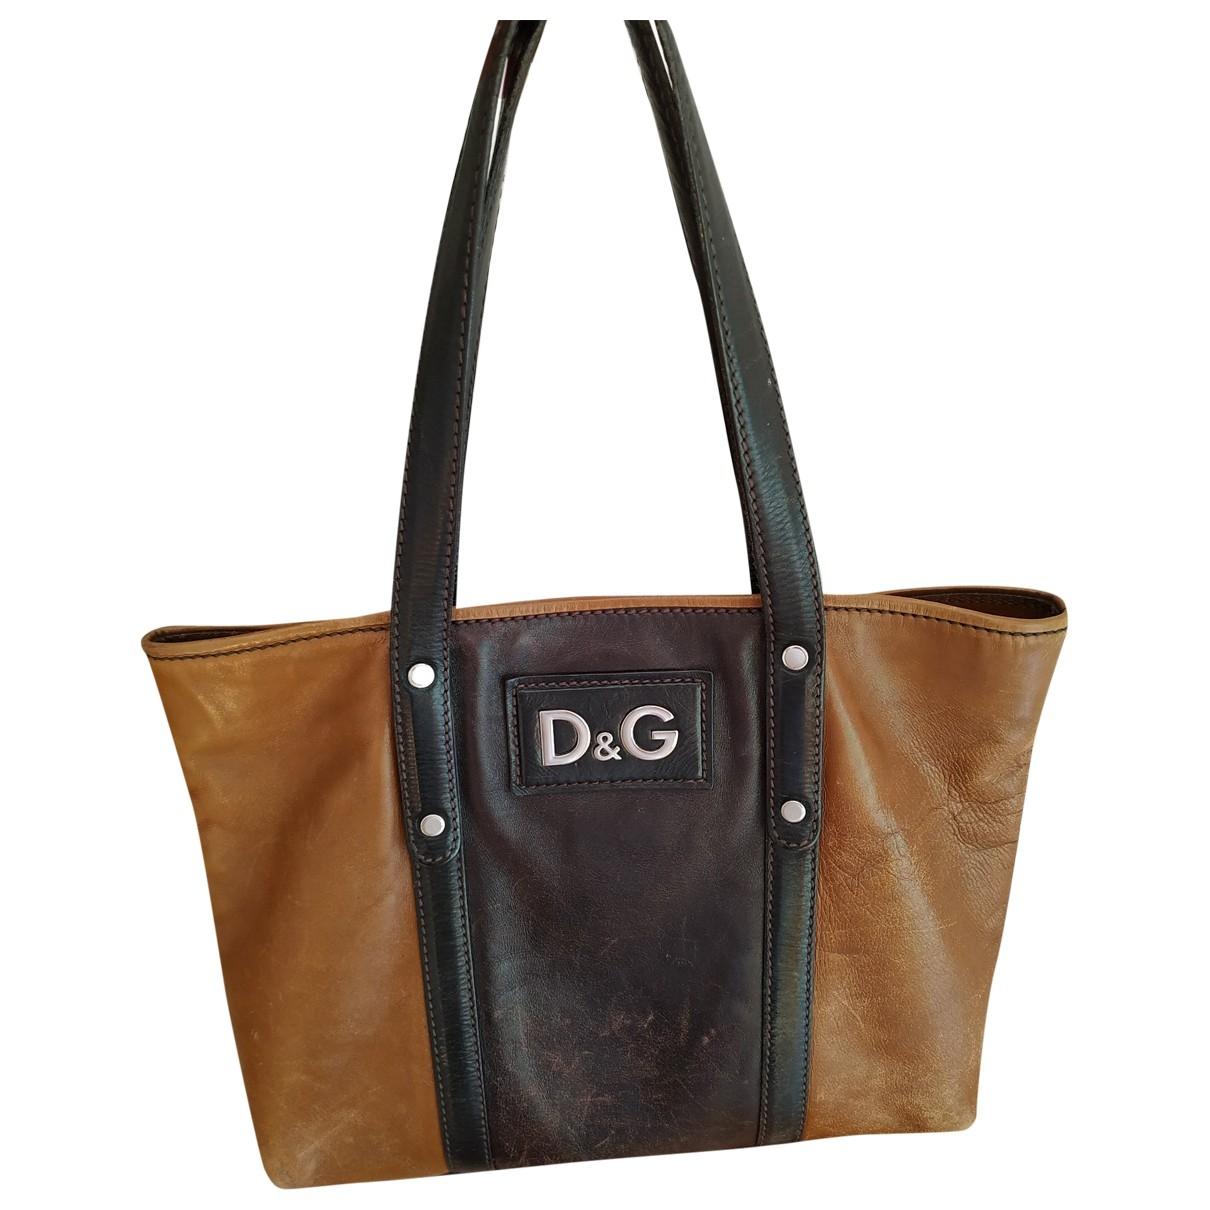 D&g \N Brown Leather handbag for Women \N